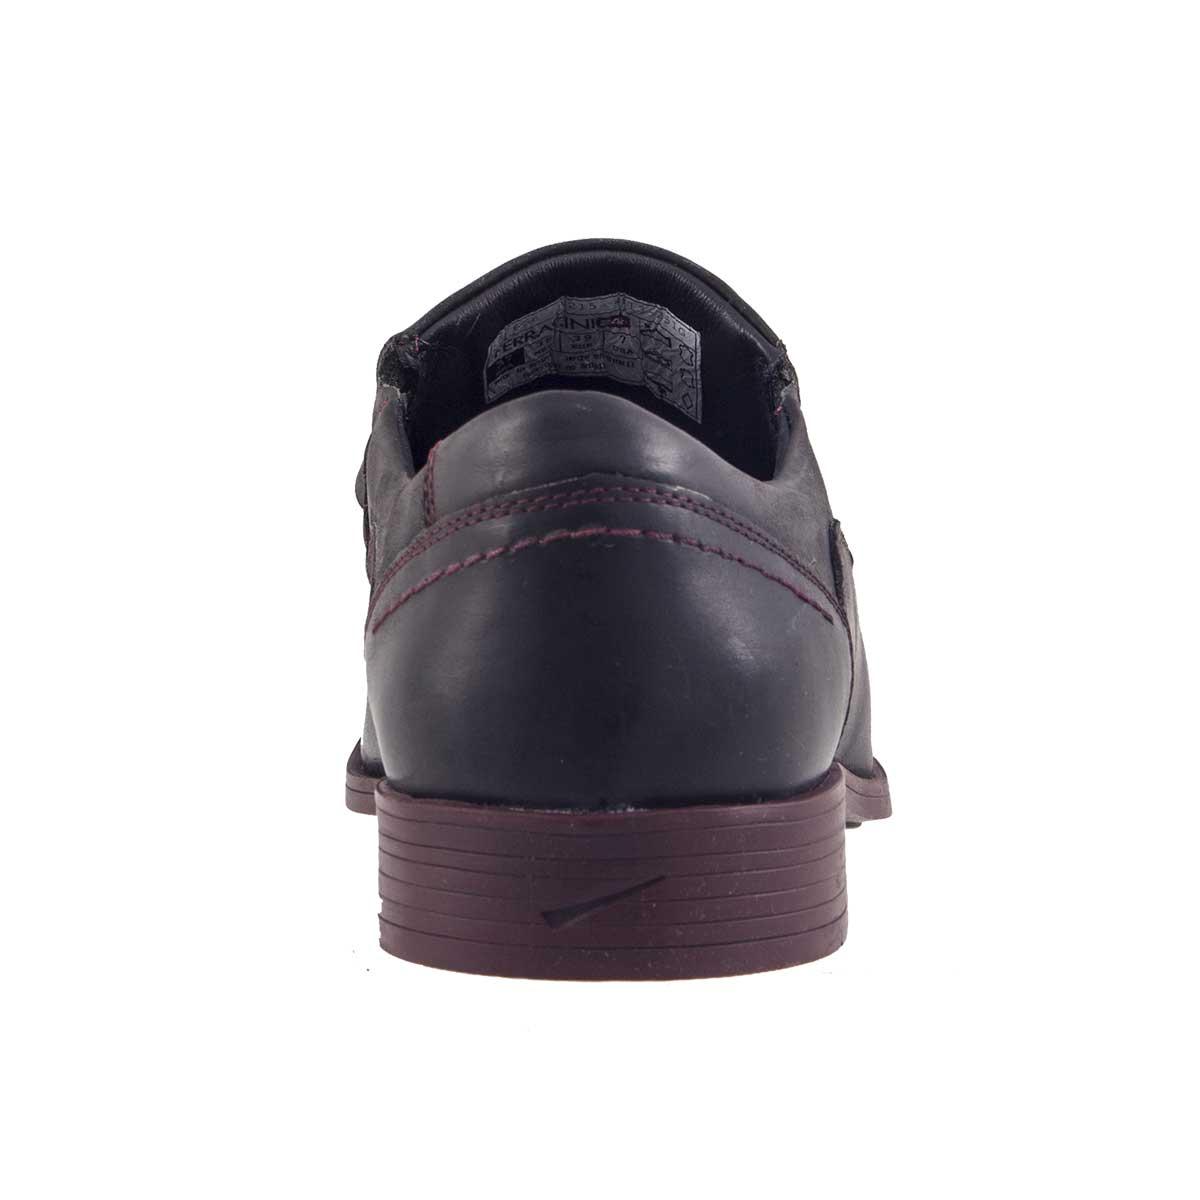 Sapato Social Sport Ferracini Dream Couro Escovado 4813-251G